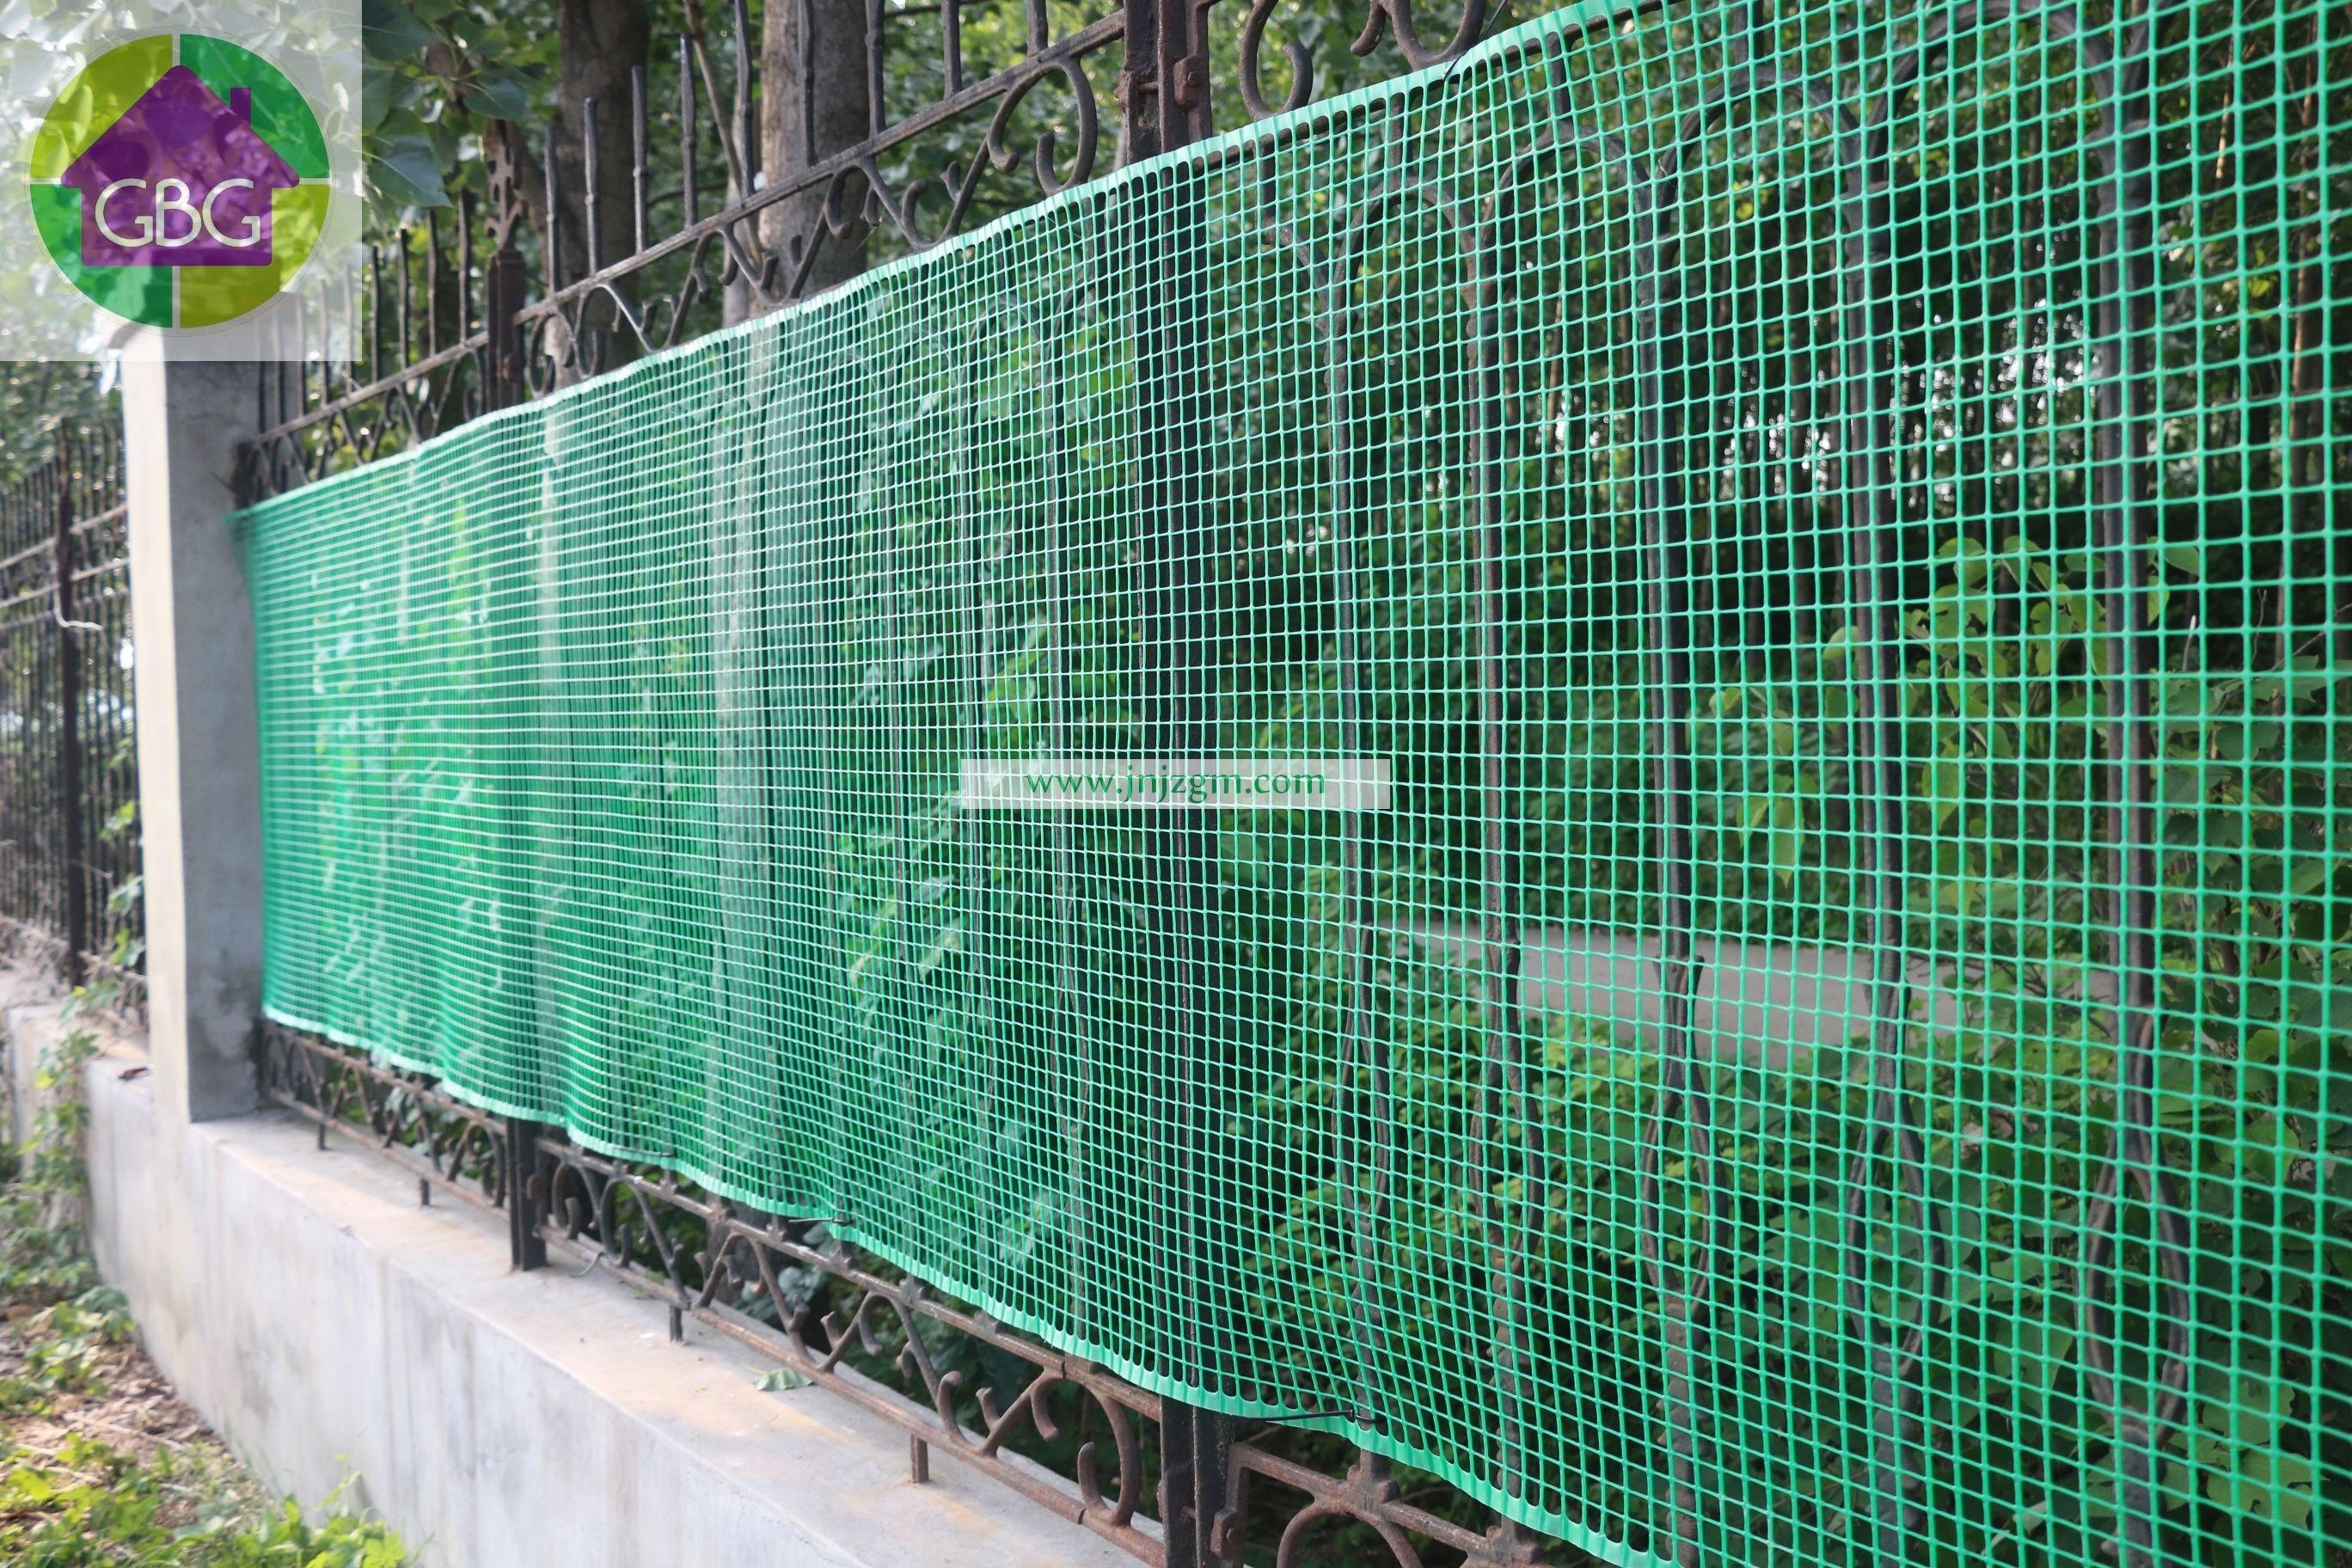 HDPE Plastic mesh . | Golden Building Products Show. | Pinterest